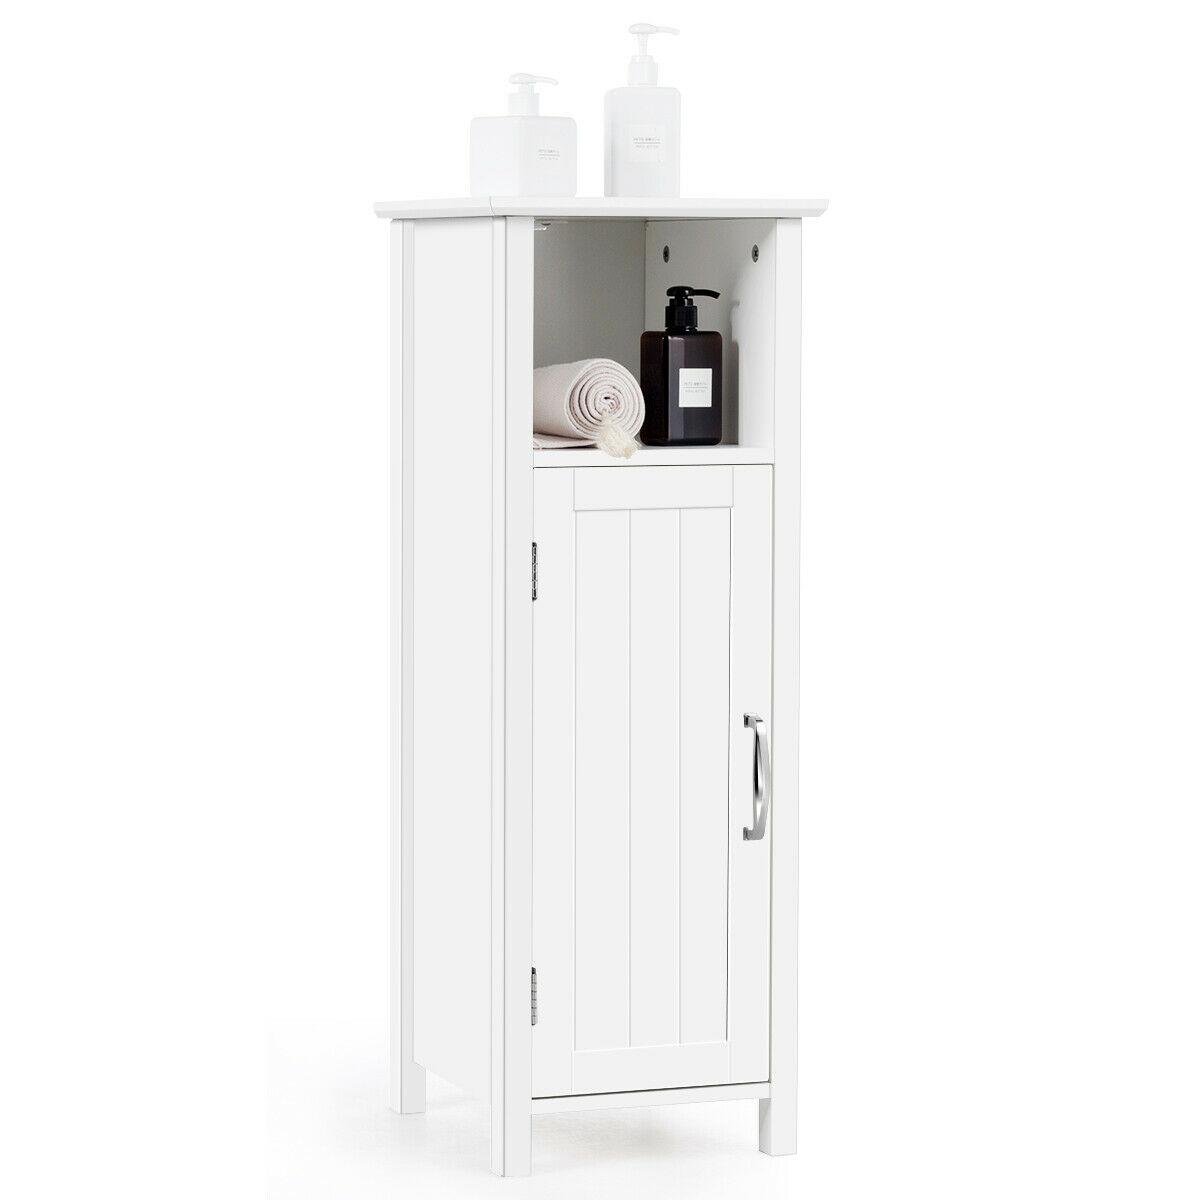 Gymax Bathroom Floor Storage Cabinet, Bathroom Floor Storage Cabinets